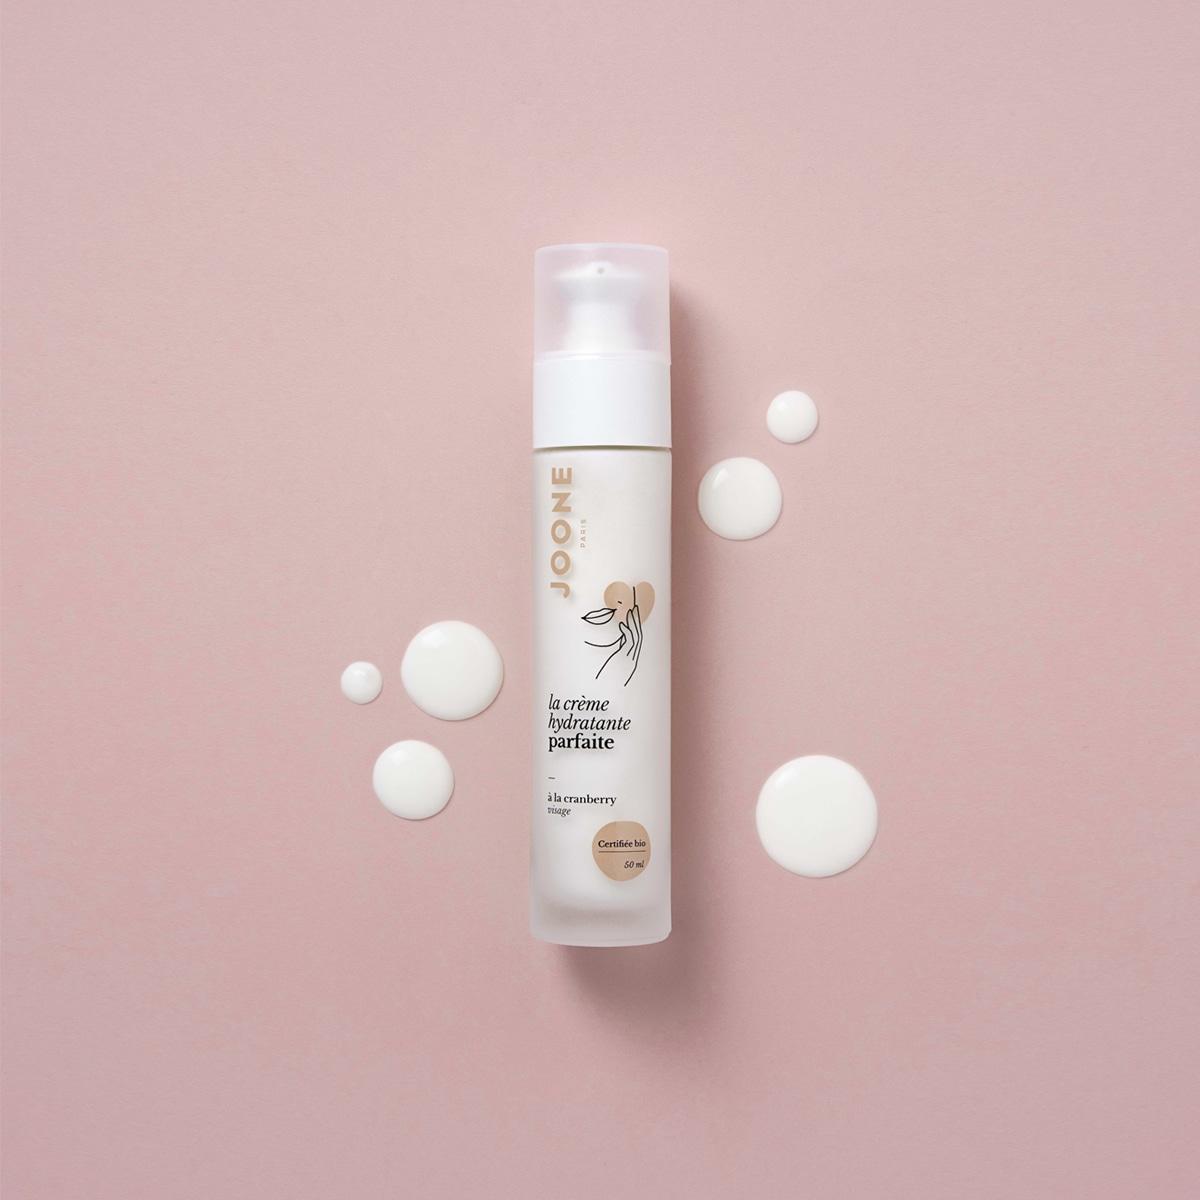 Crème hydratante Joone, bio, ultra nature et made in France